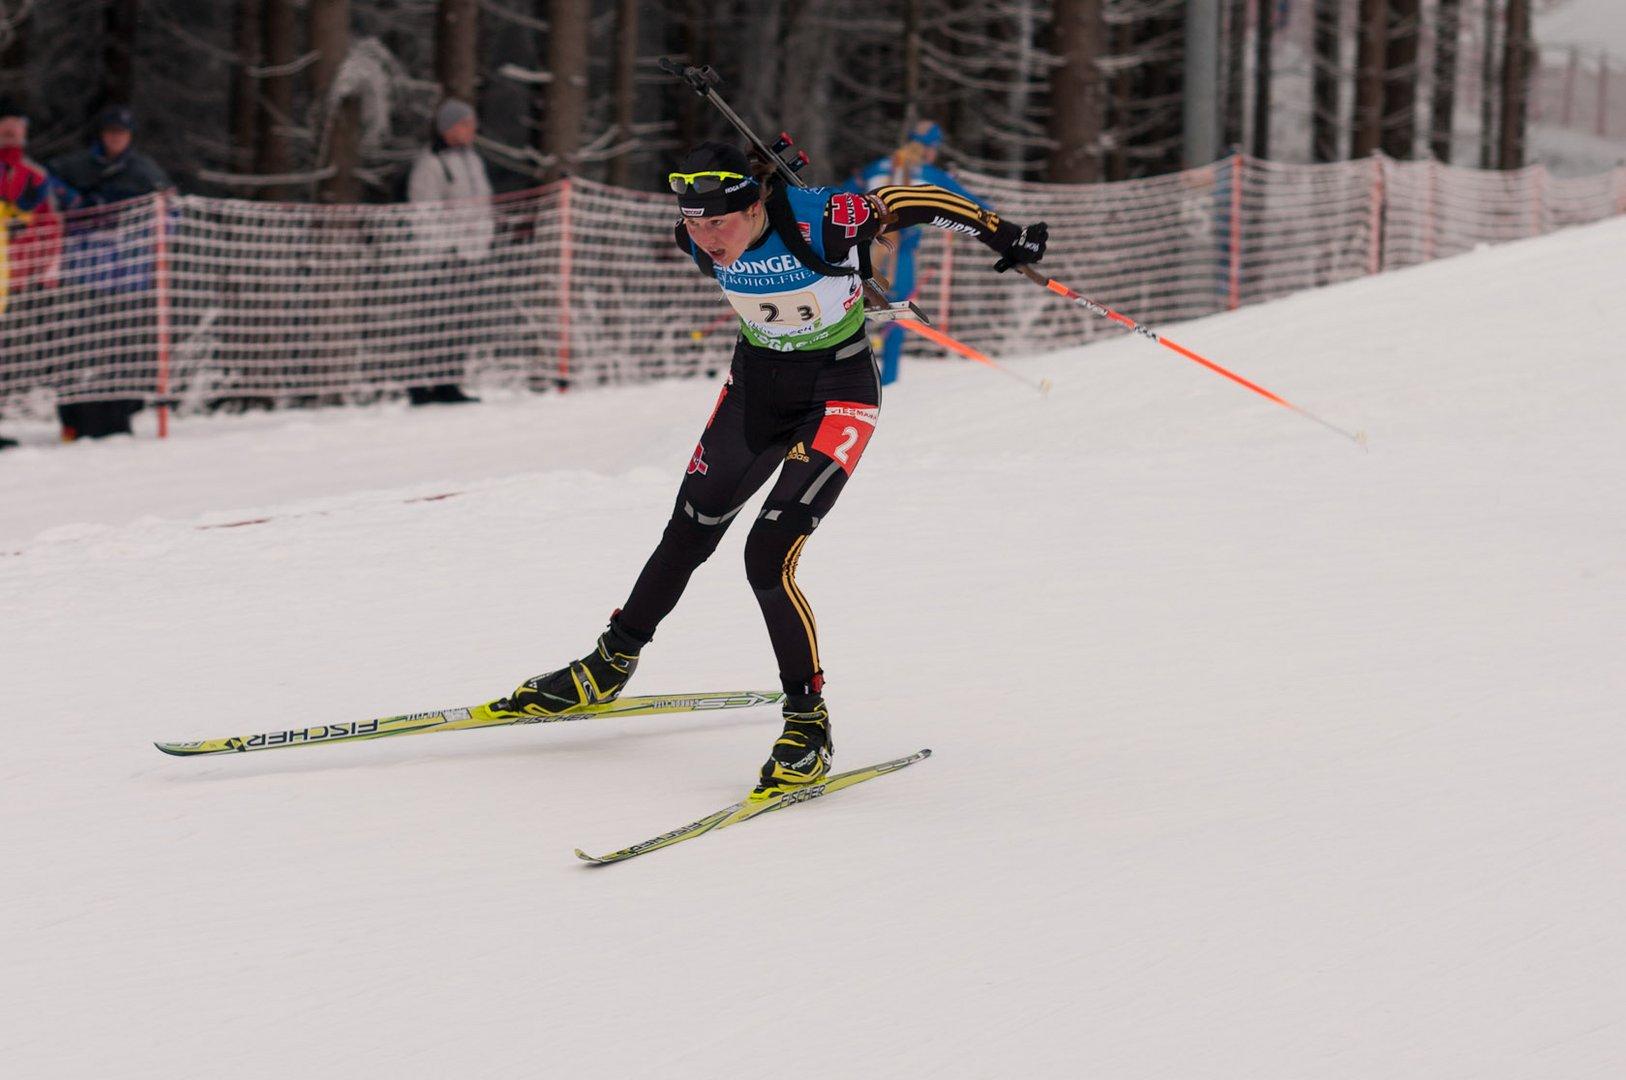 Mein Lieblingssport: Biathlon